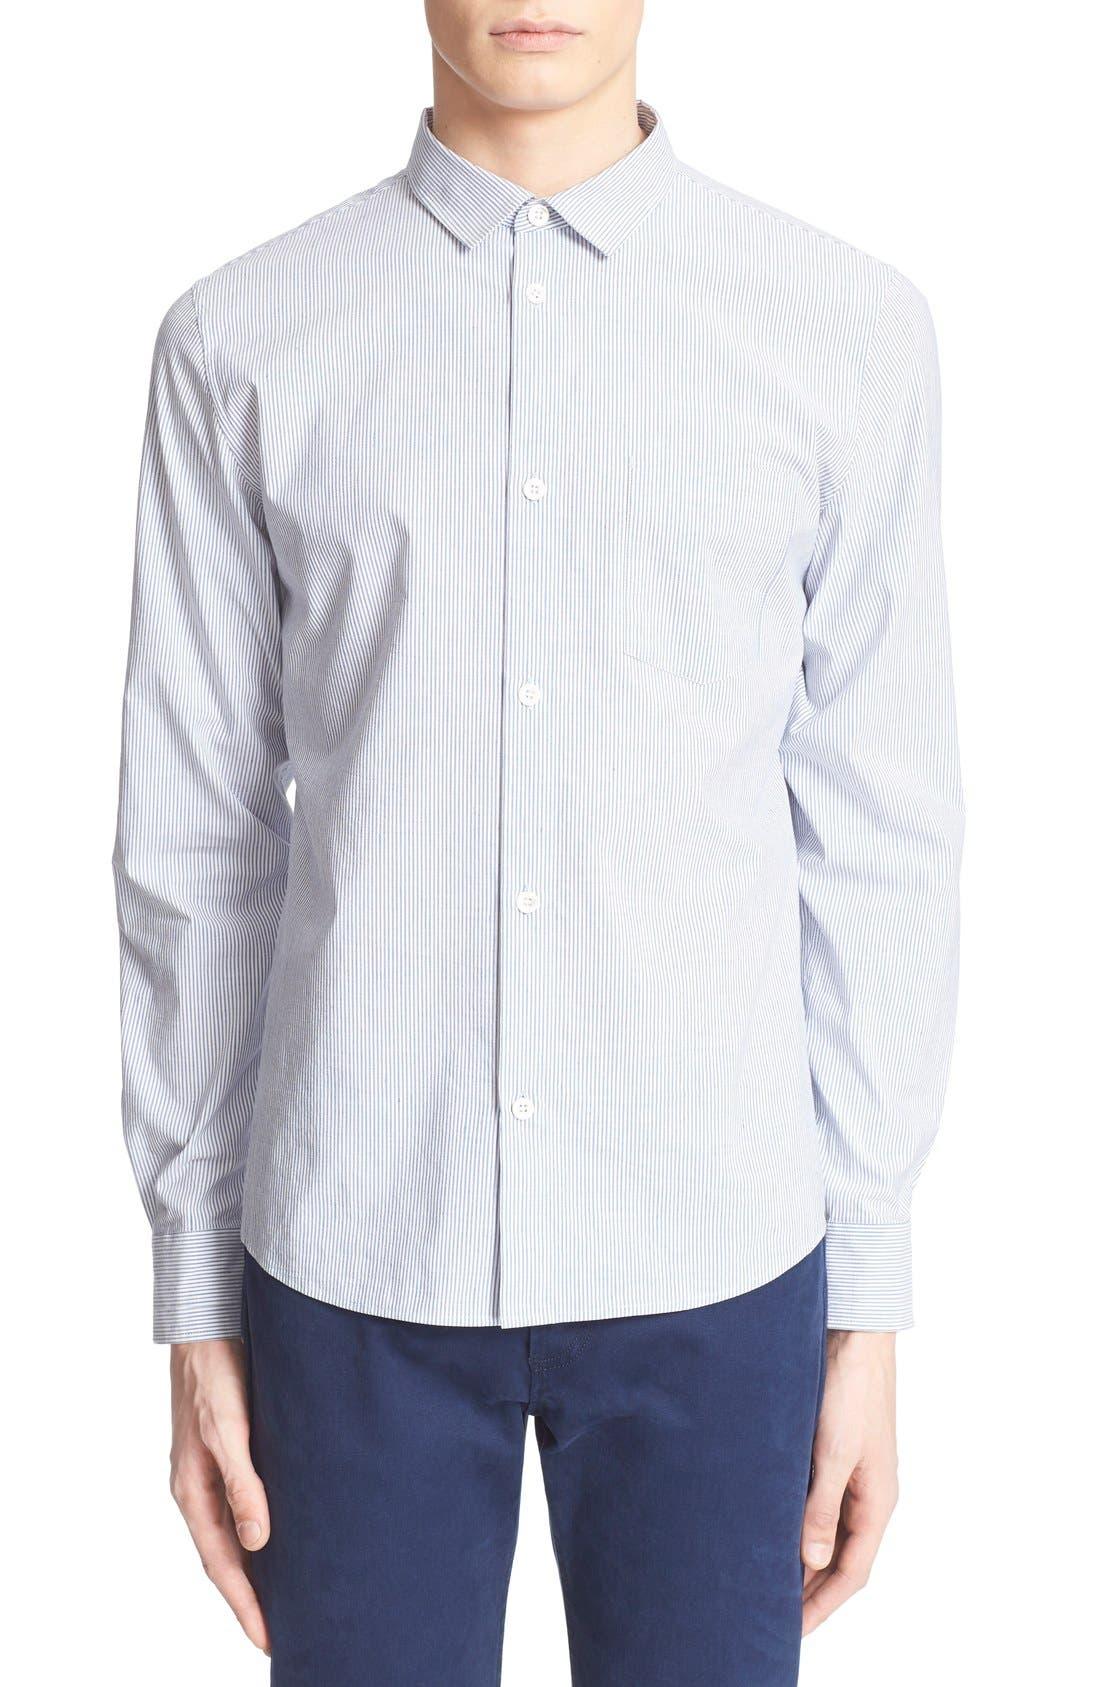 A.P.C. 'Etienne' Pinstripe Woven Shirt